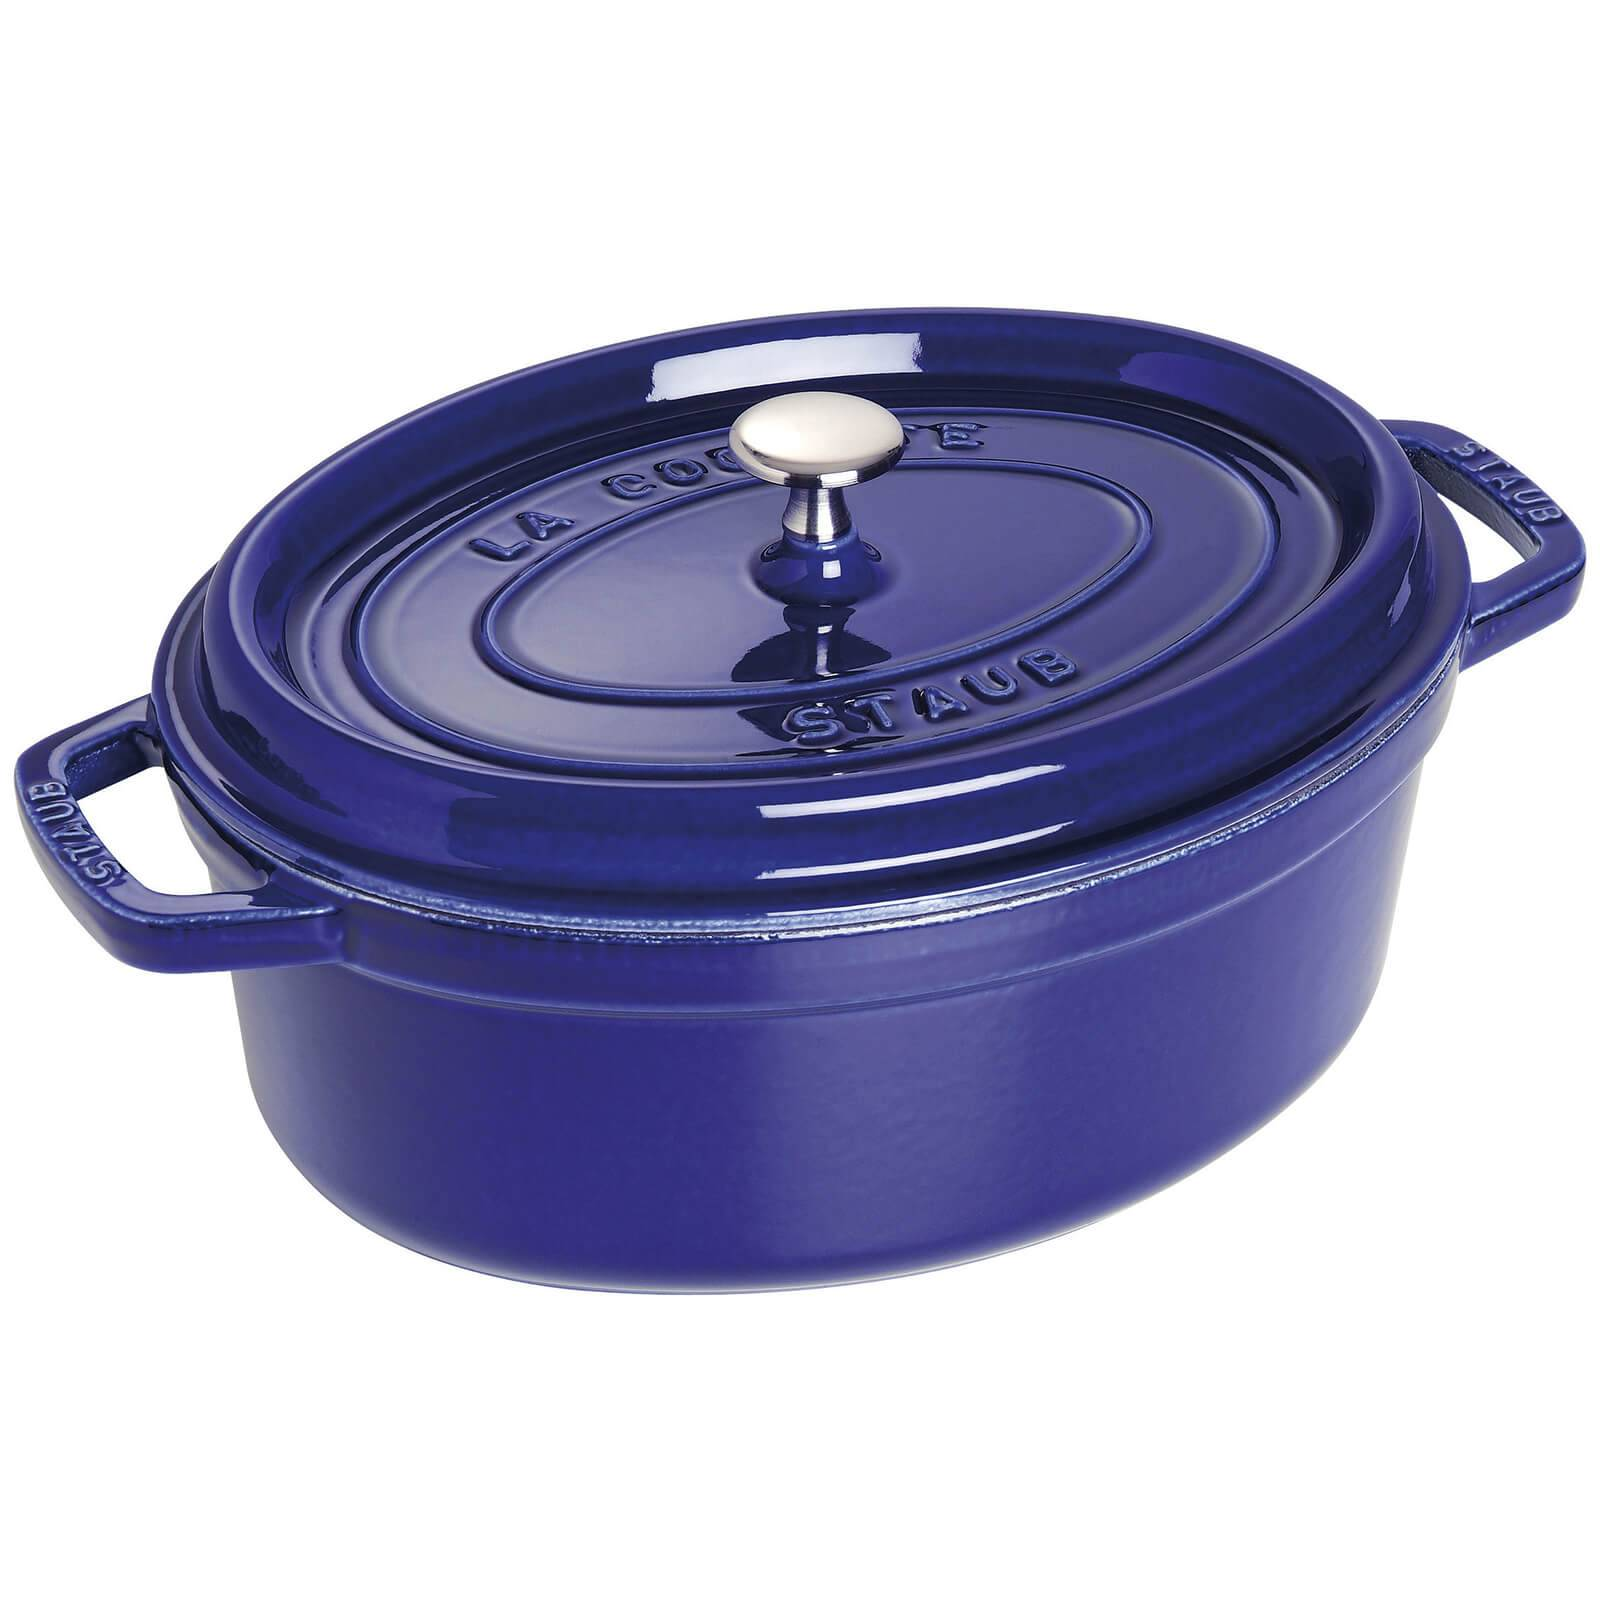 Staub Oval Cocotte - Dark Blue - 29cm